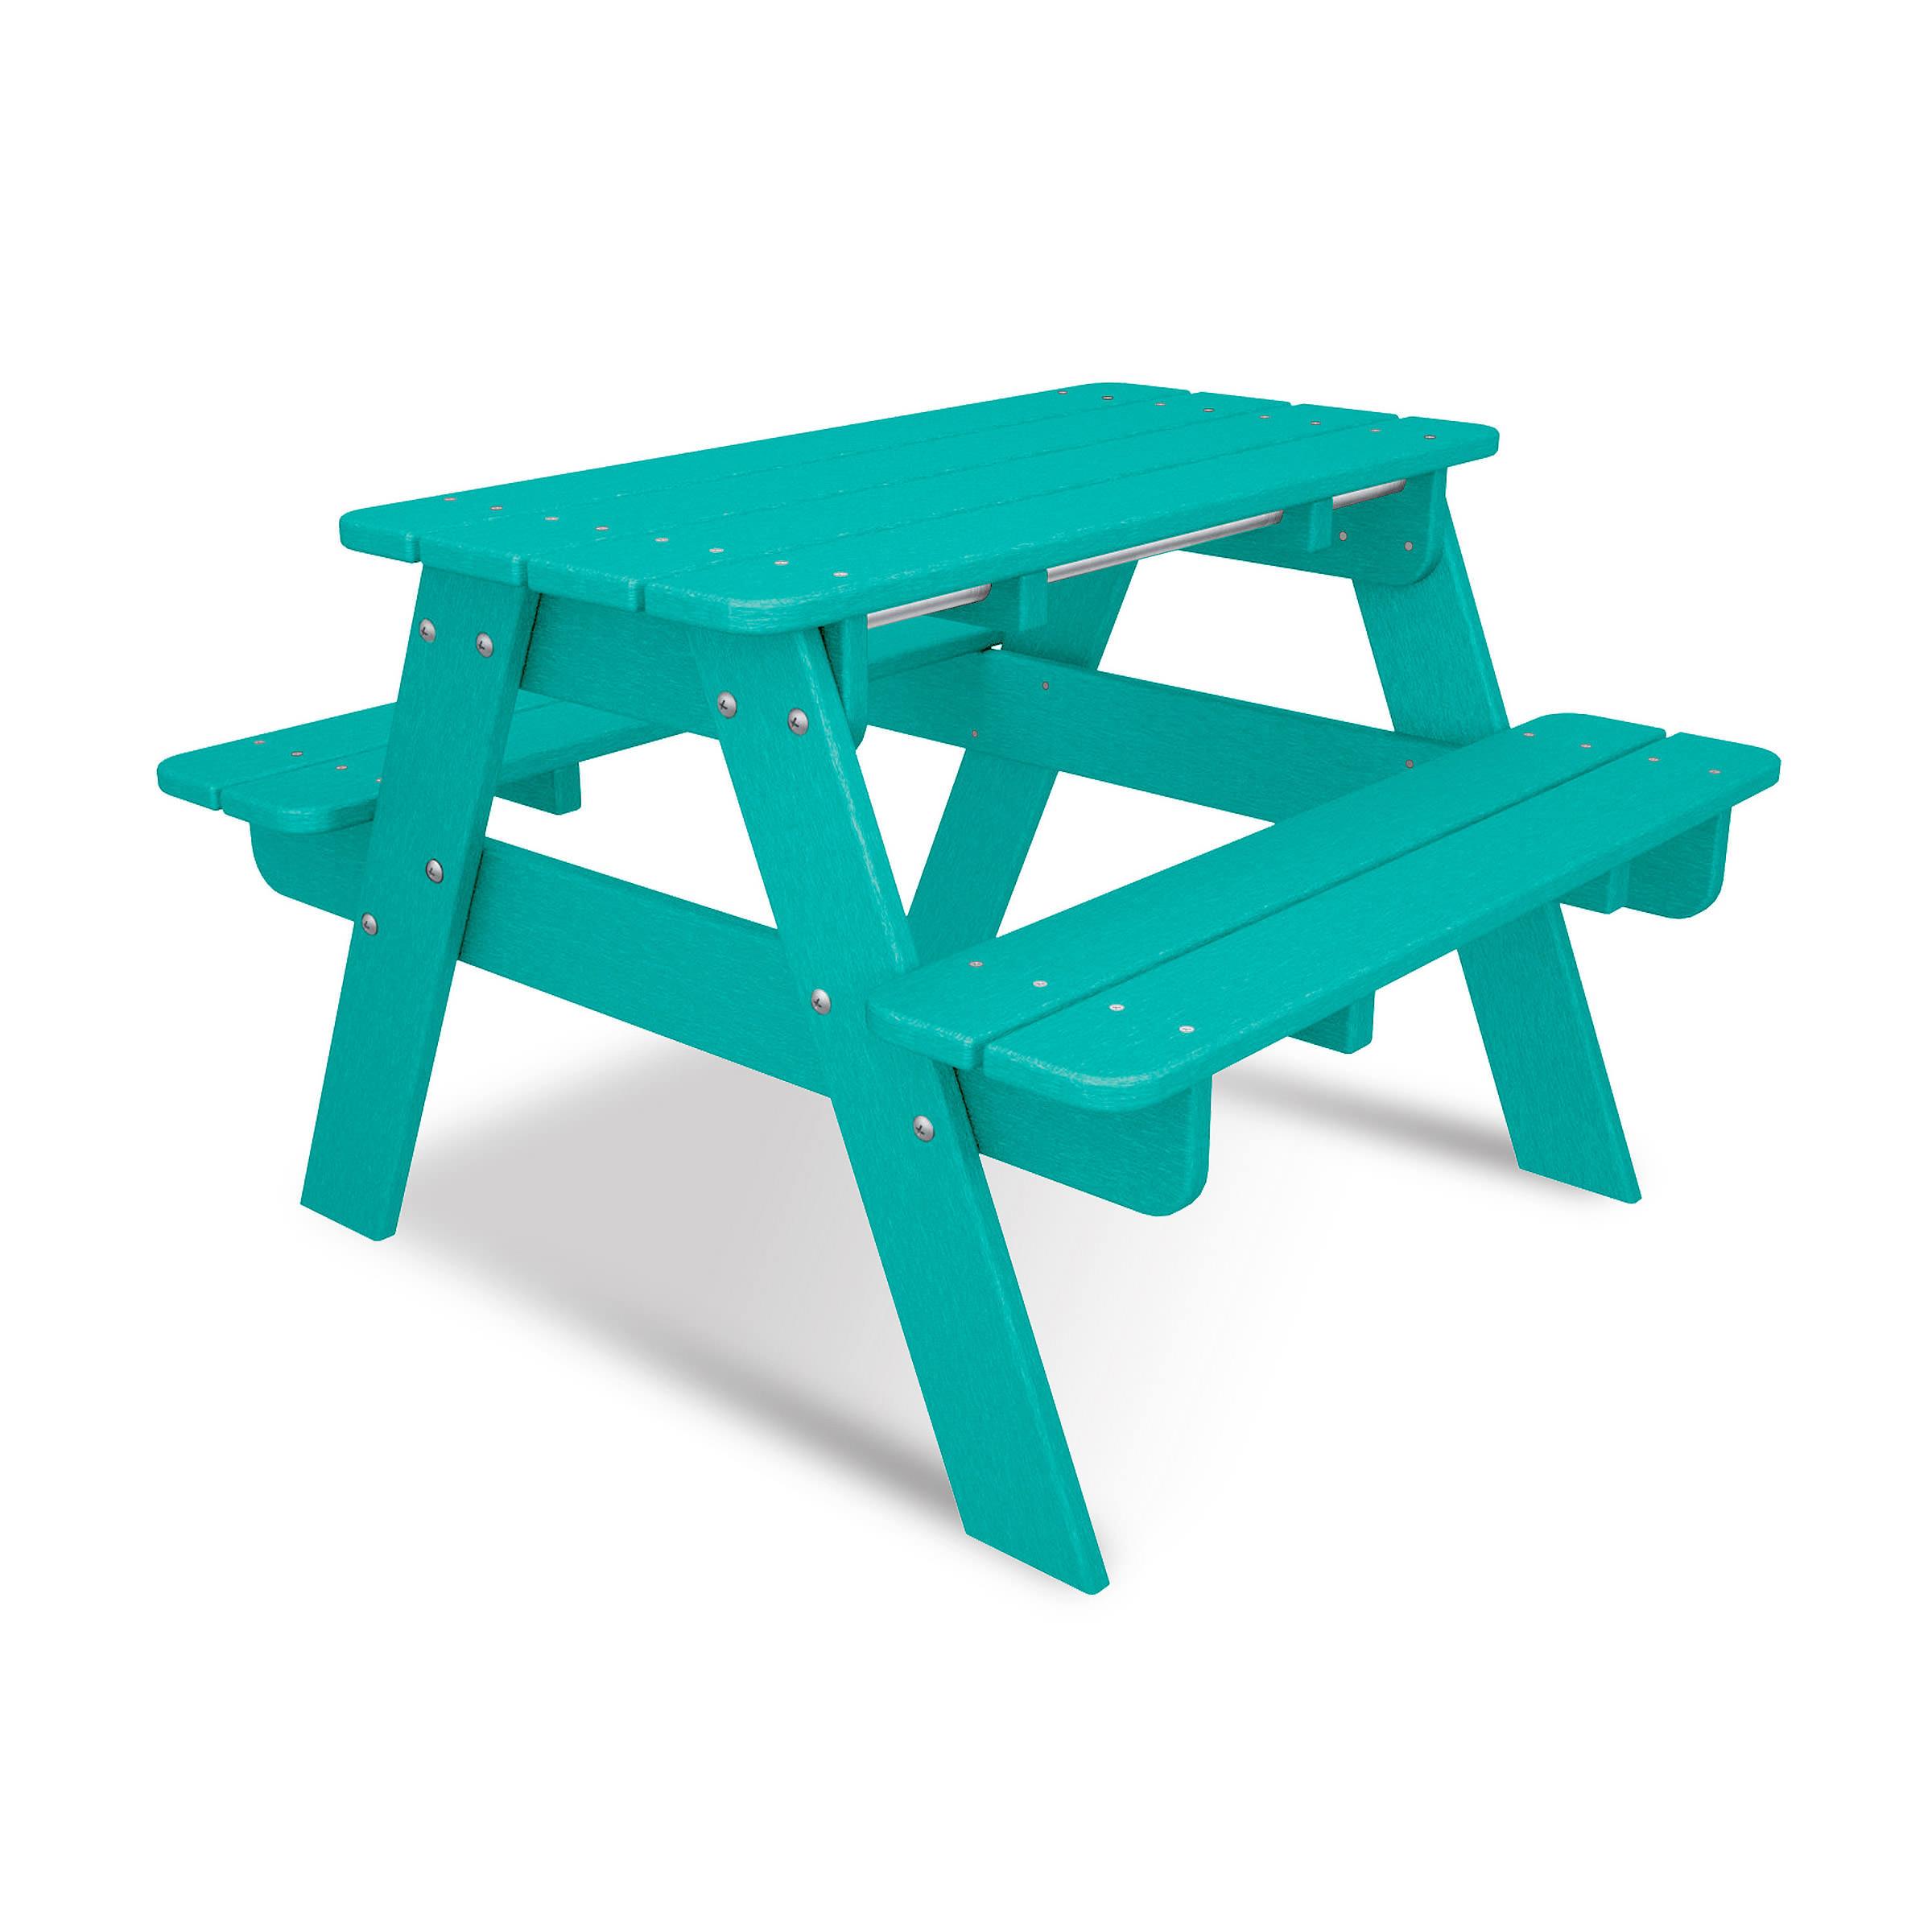 POLYWOOD Kid Picnic Table Kids Collections - Teal picnic table